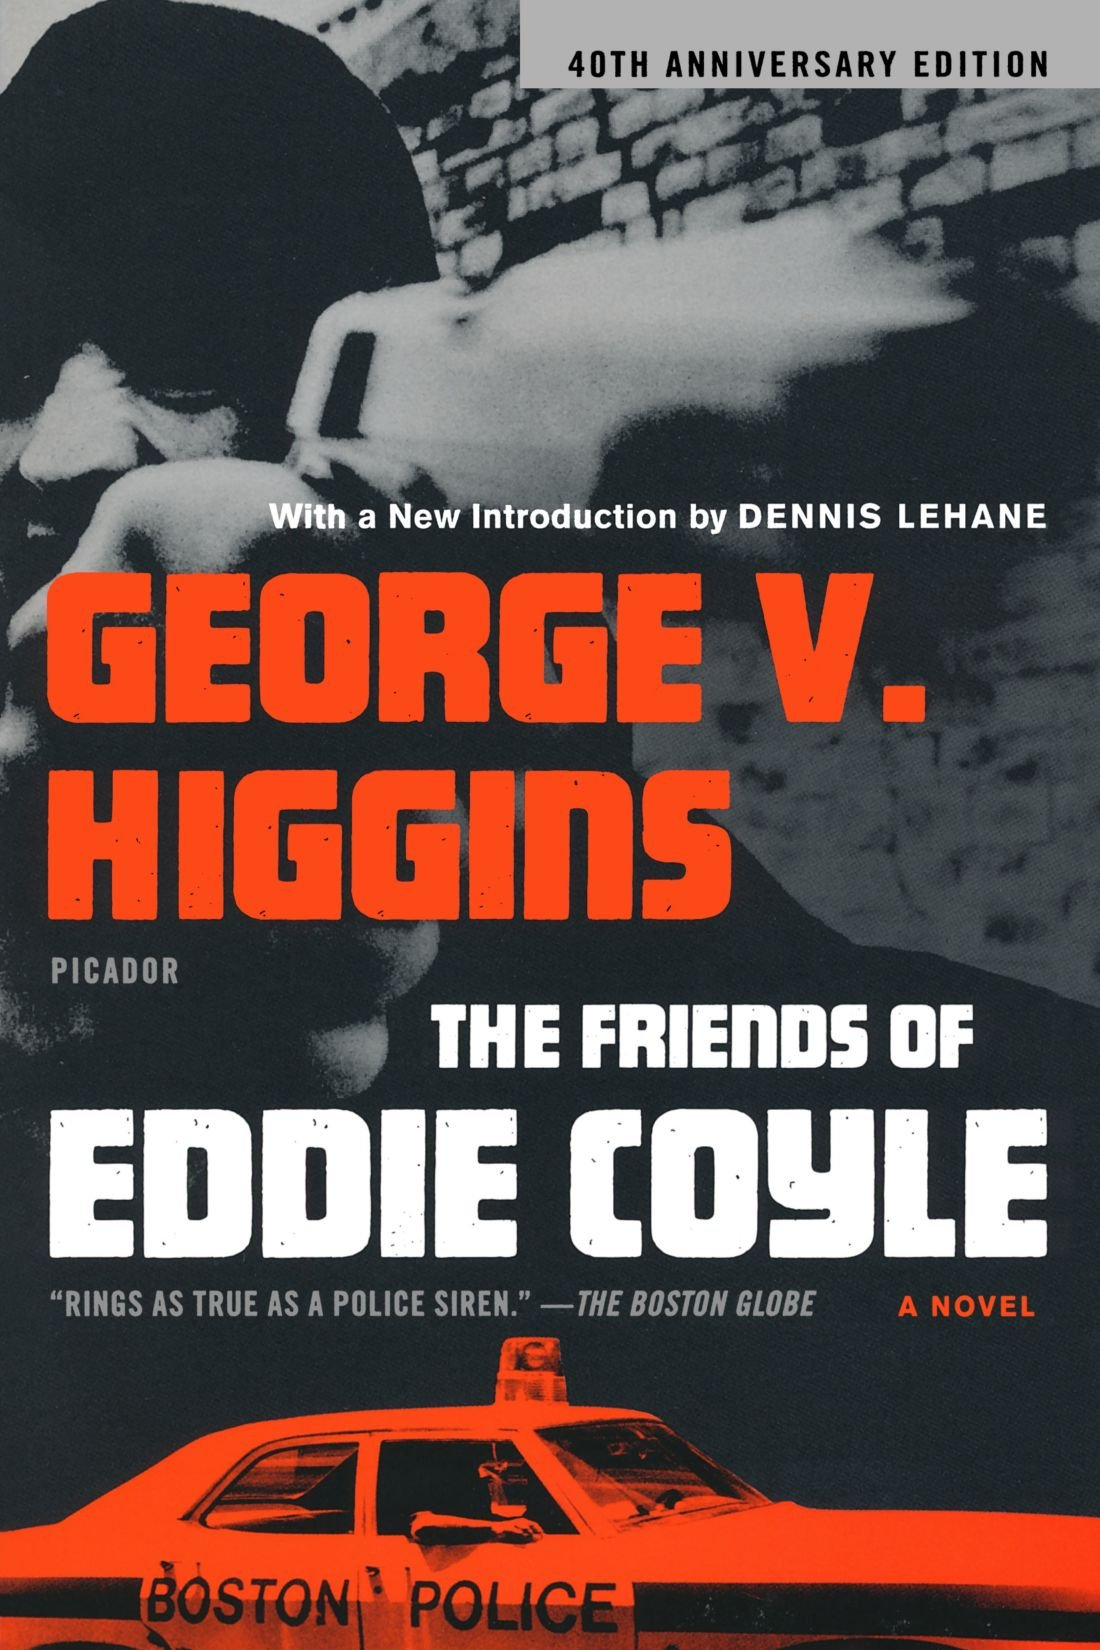 Amazon.com: The Friends of Eddie Coyle: A Novel (9780312429690 ...